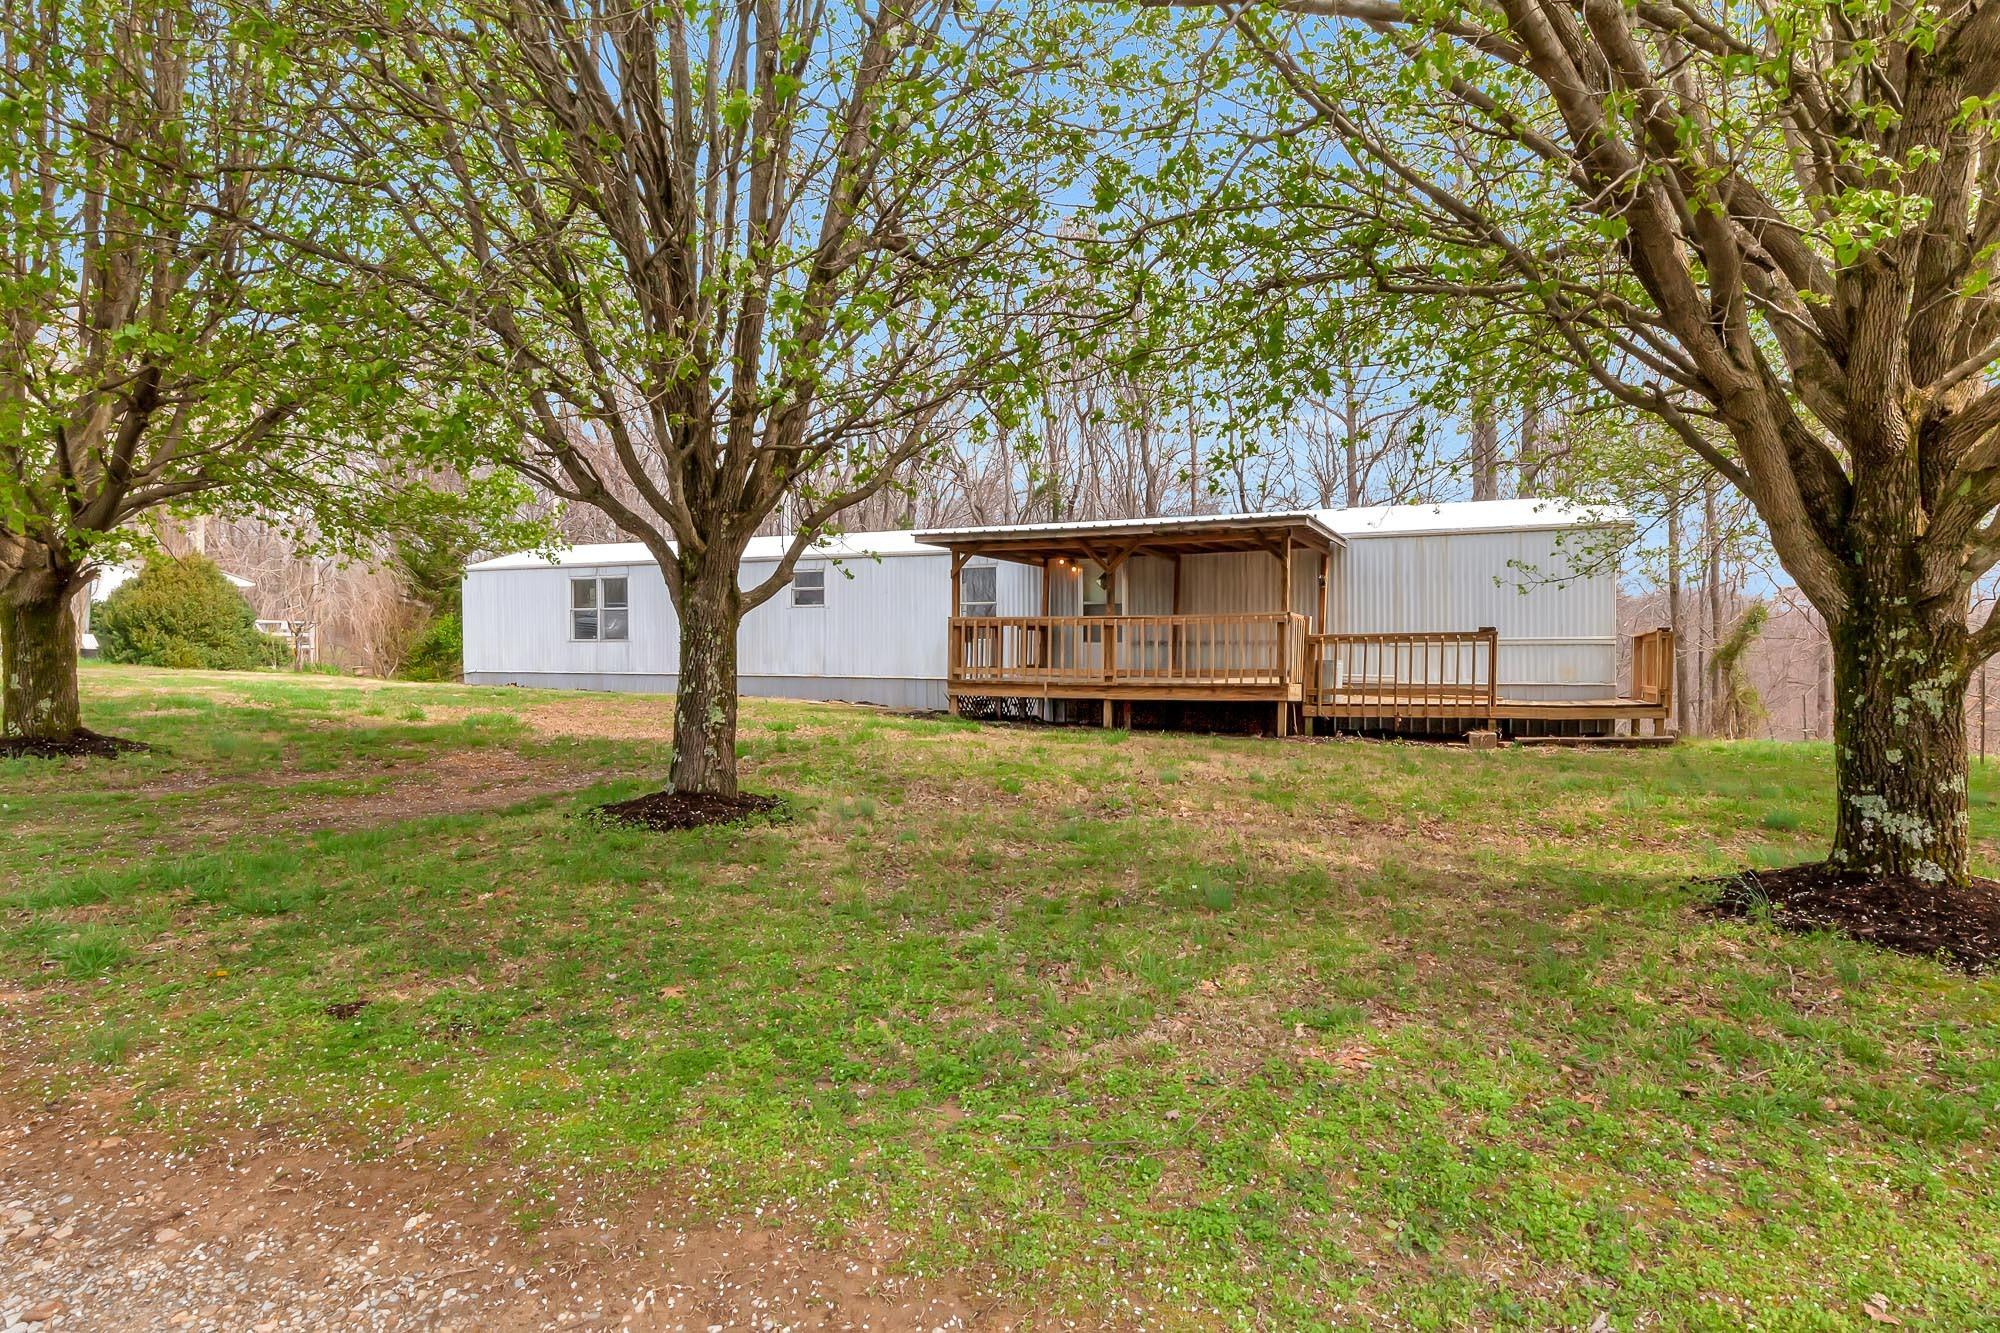 525 Countrywood Ln, Gainesboro, TN 38562 - Gainesboro, TN real estate listing